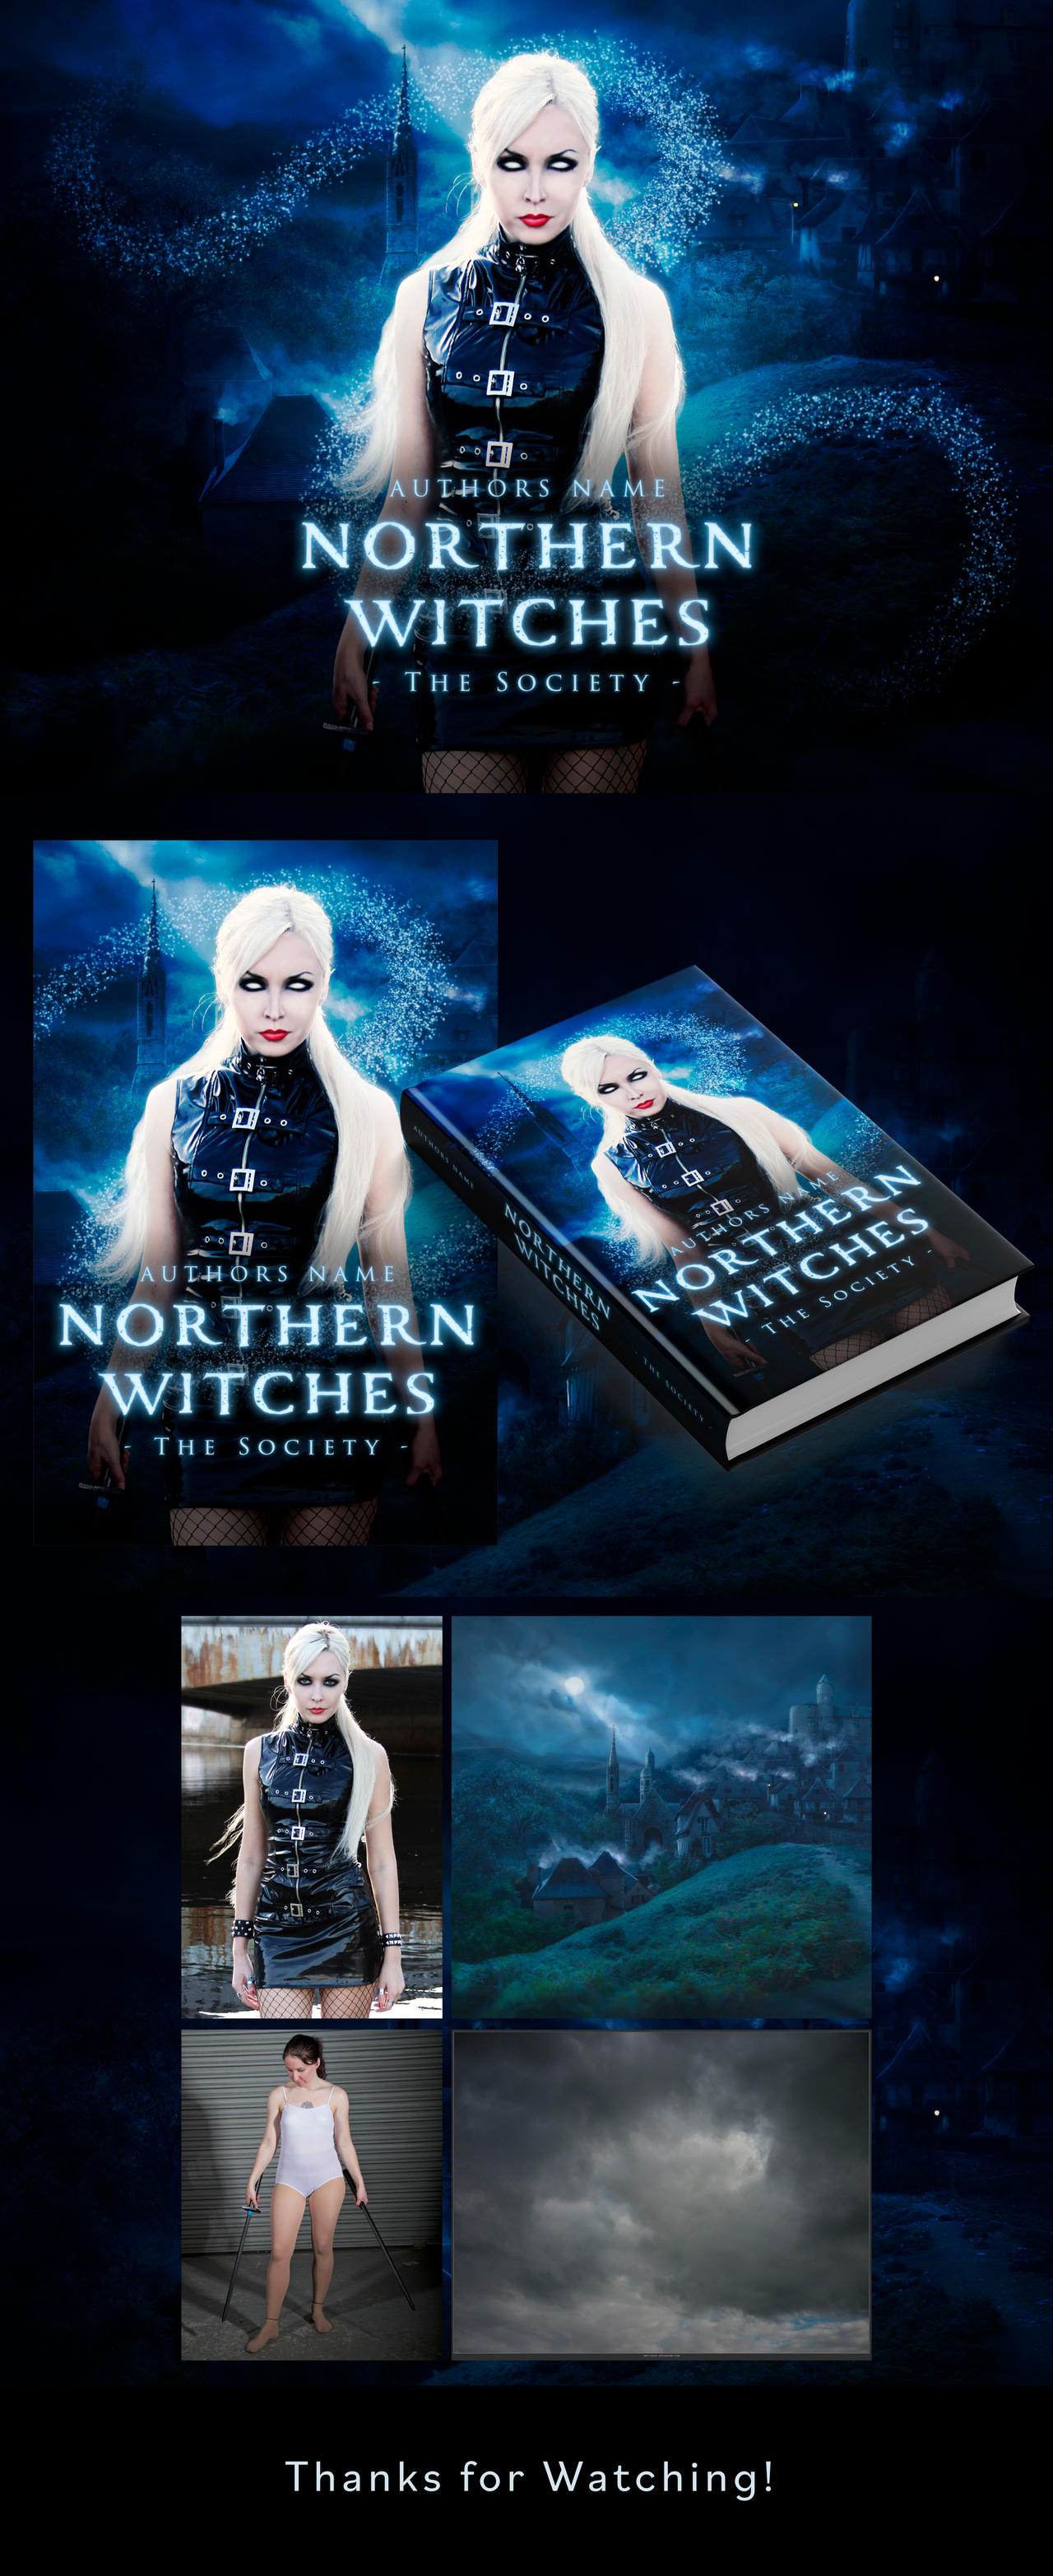 Northern-witches-apresentacao-1